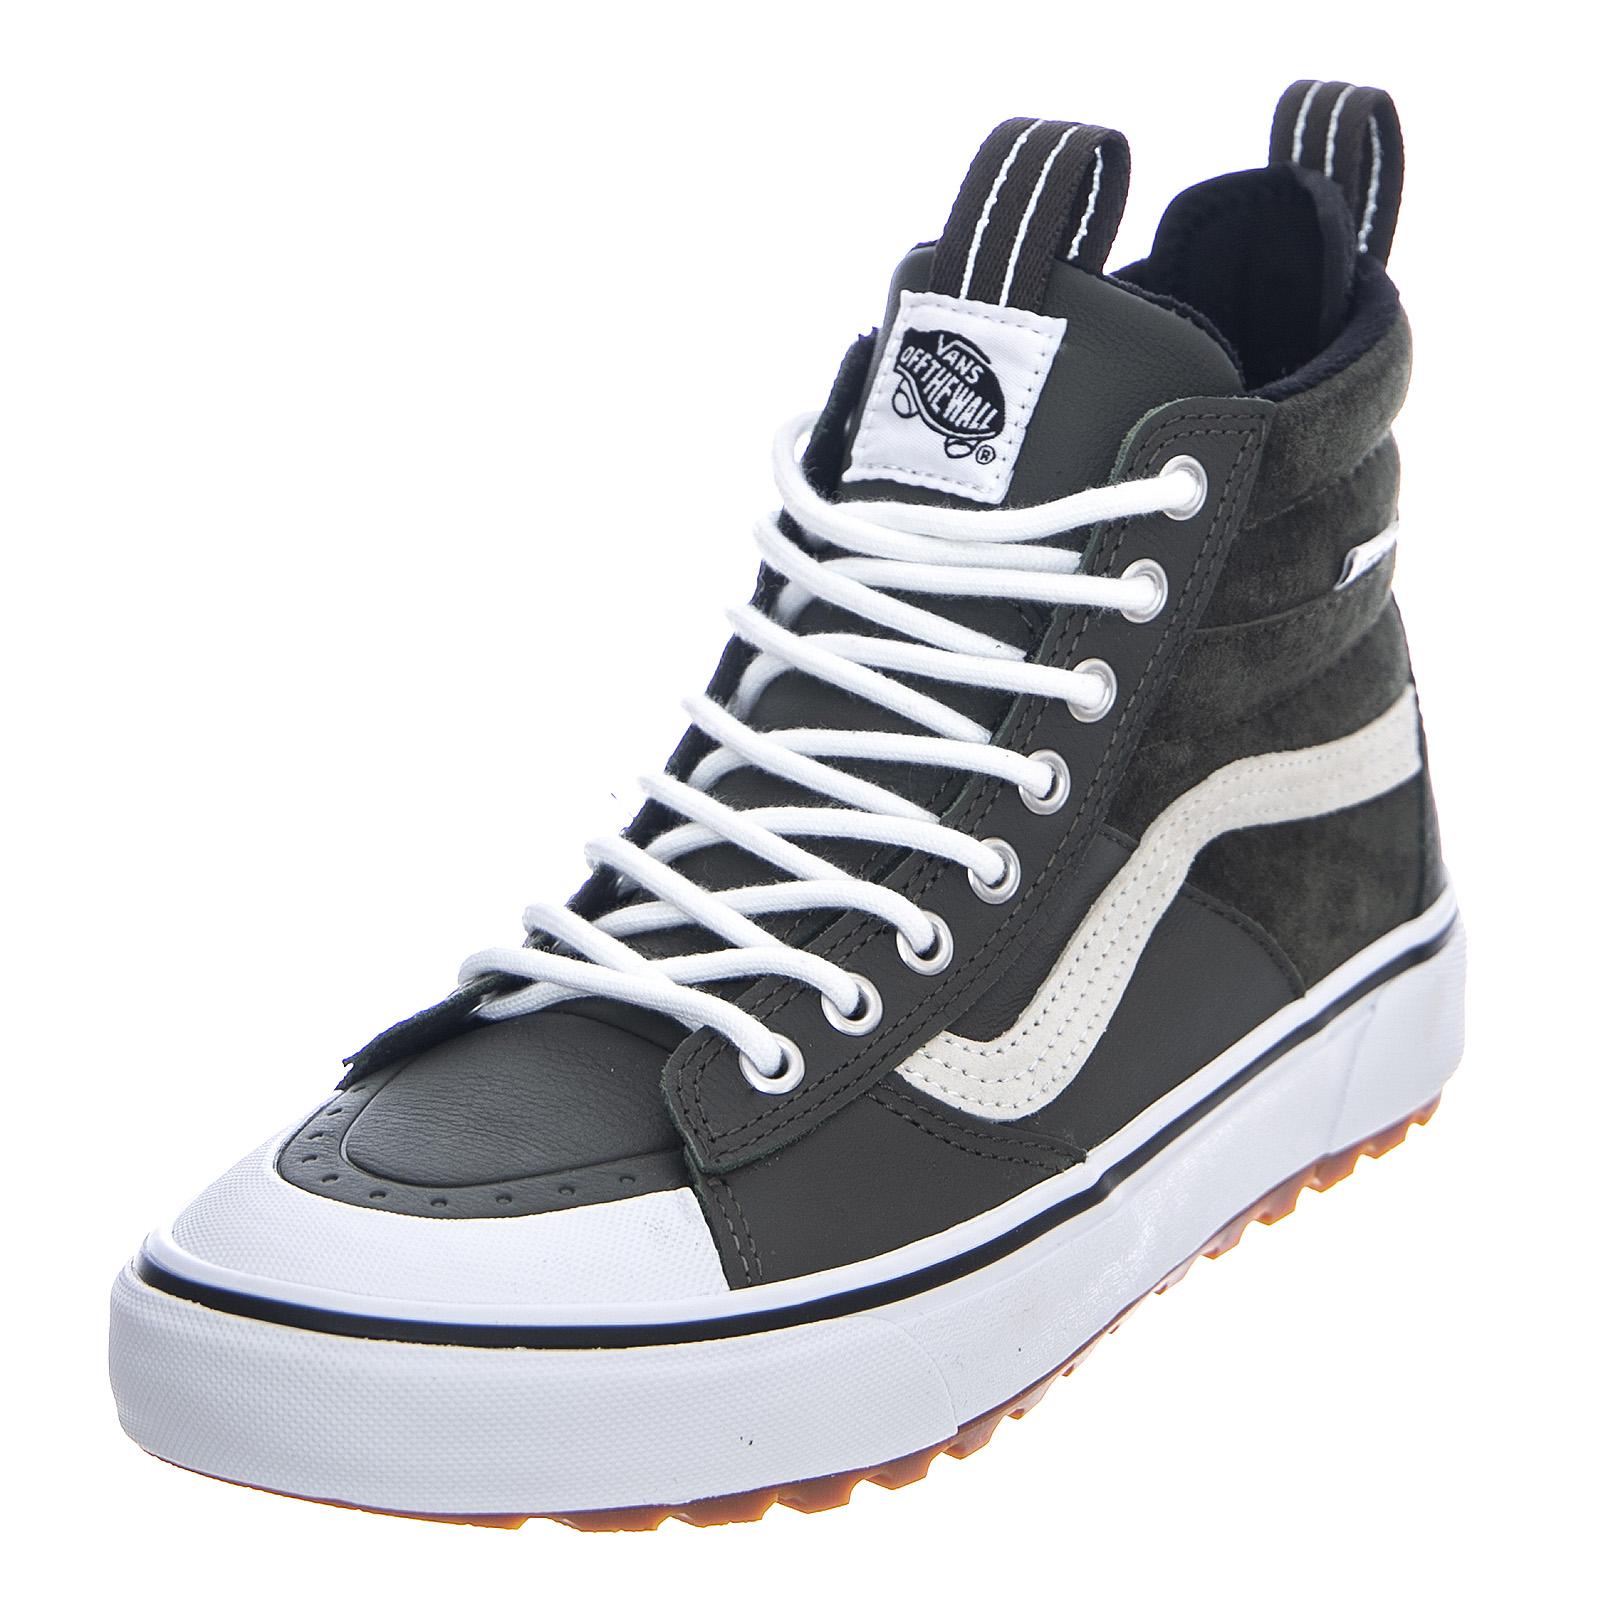 Details about Vans sk8 hi mte 2.0 dx forest night true white shoes high man green